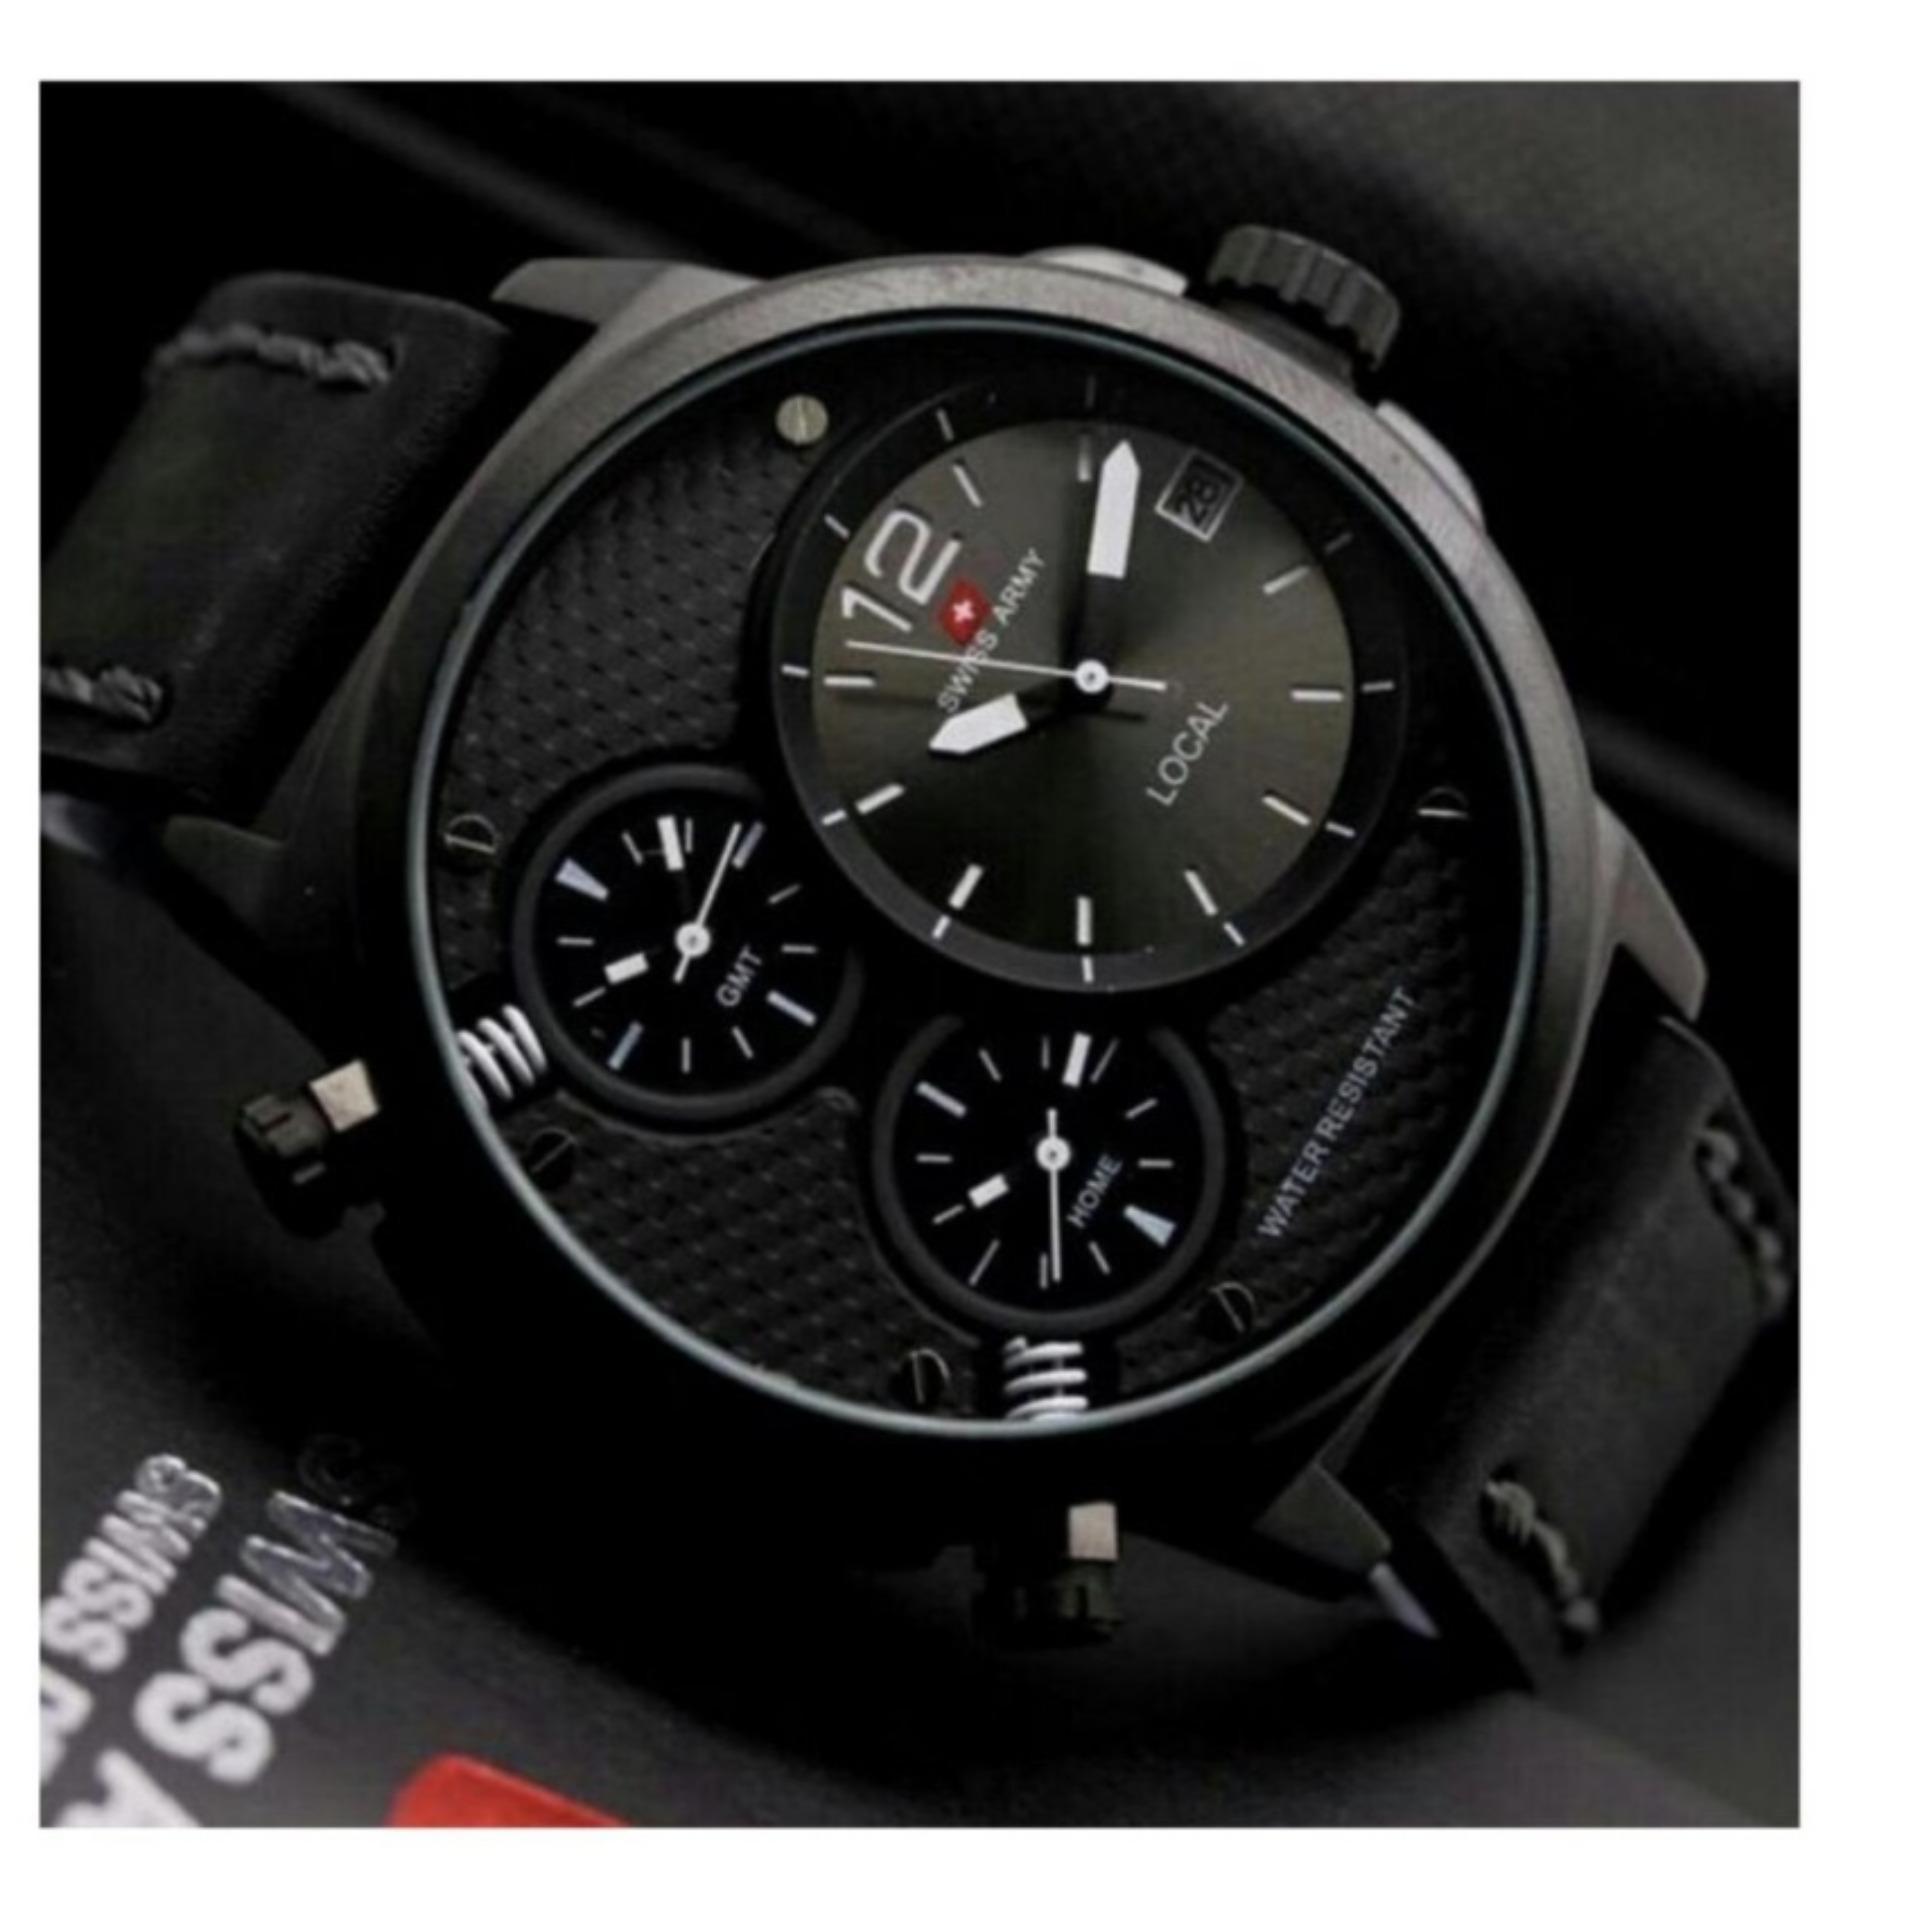 ... Shock Price Original Swiss Army Triple Time Tanggal Jam Tangan Pria Tali Kulit Leather